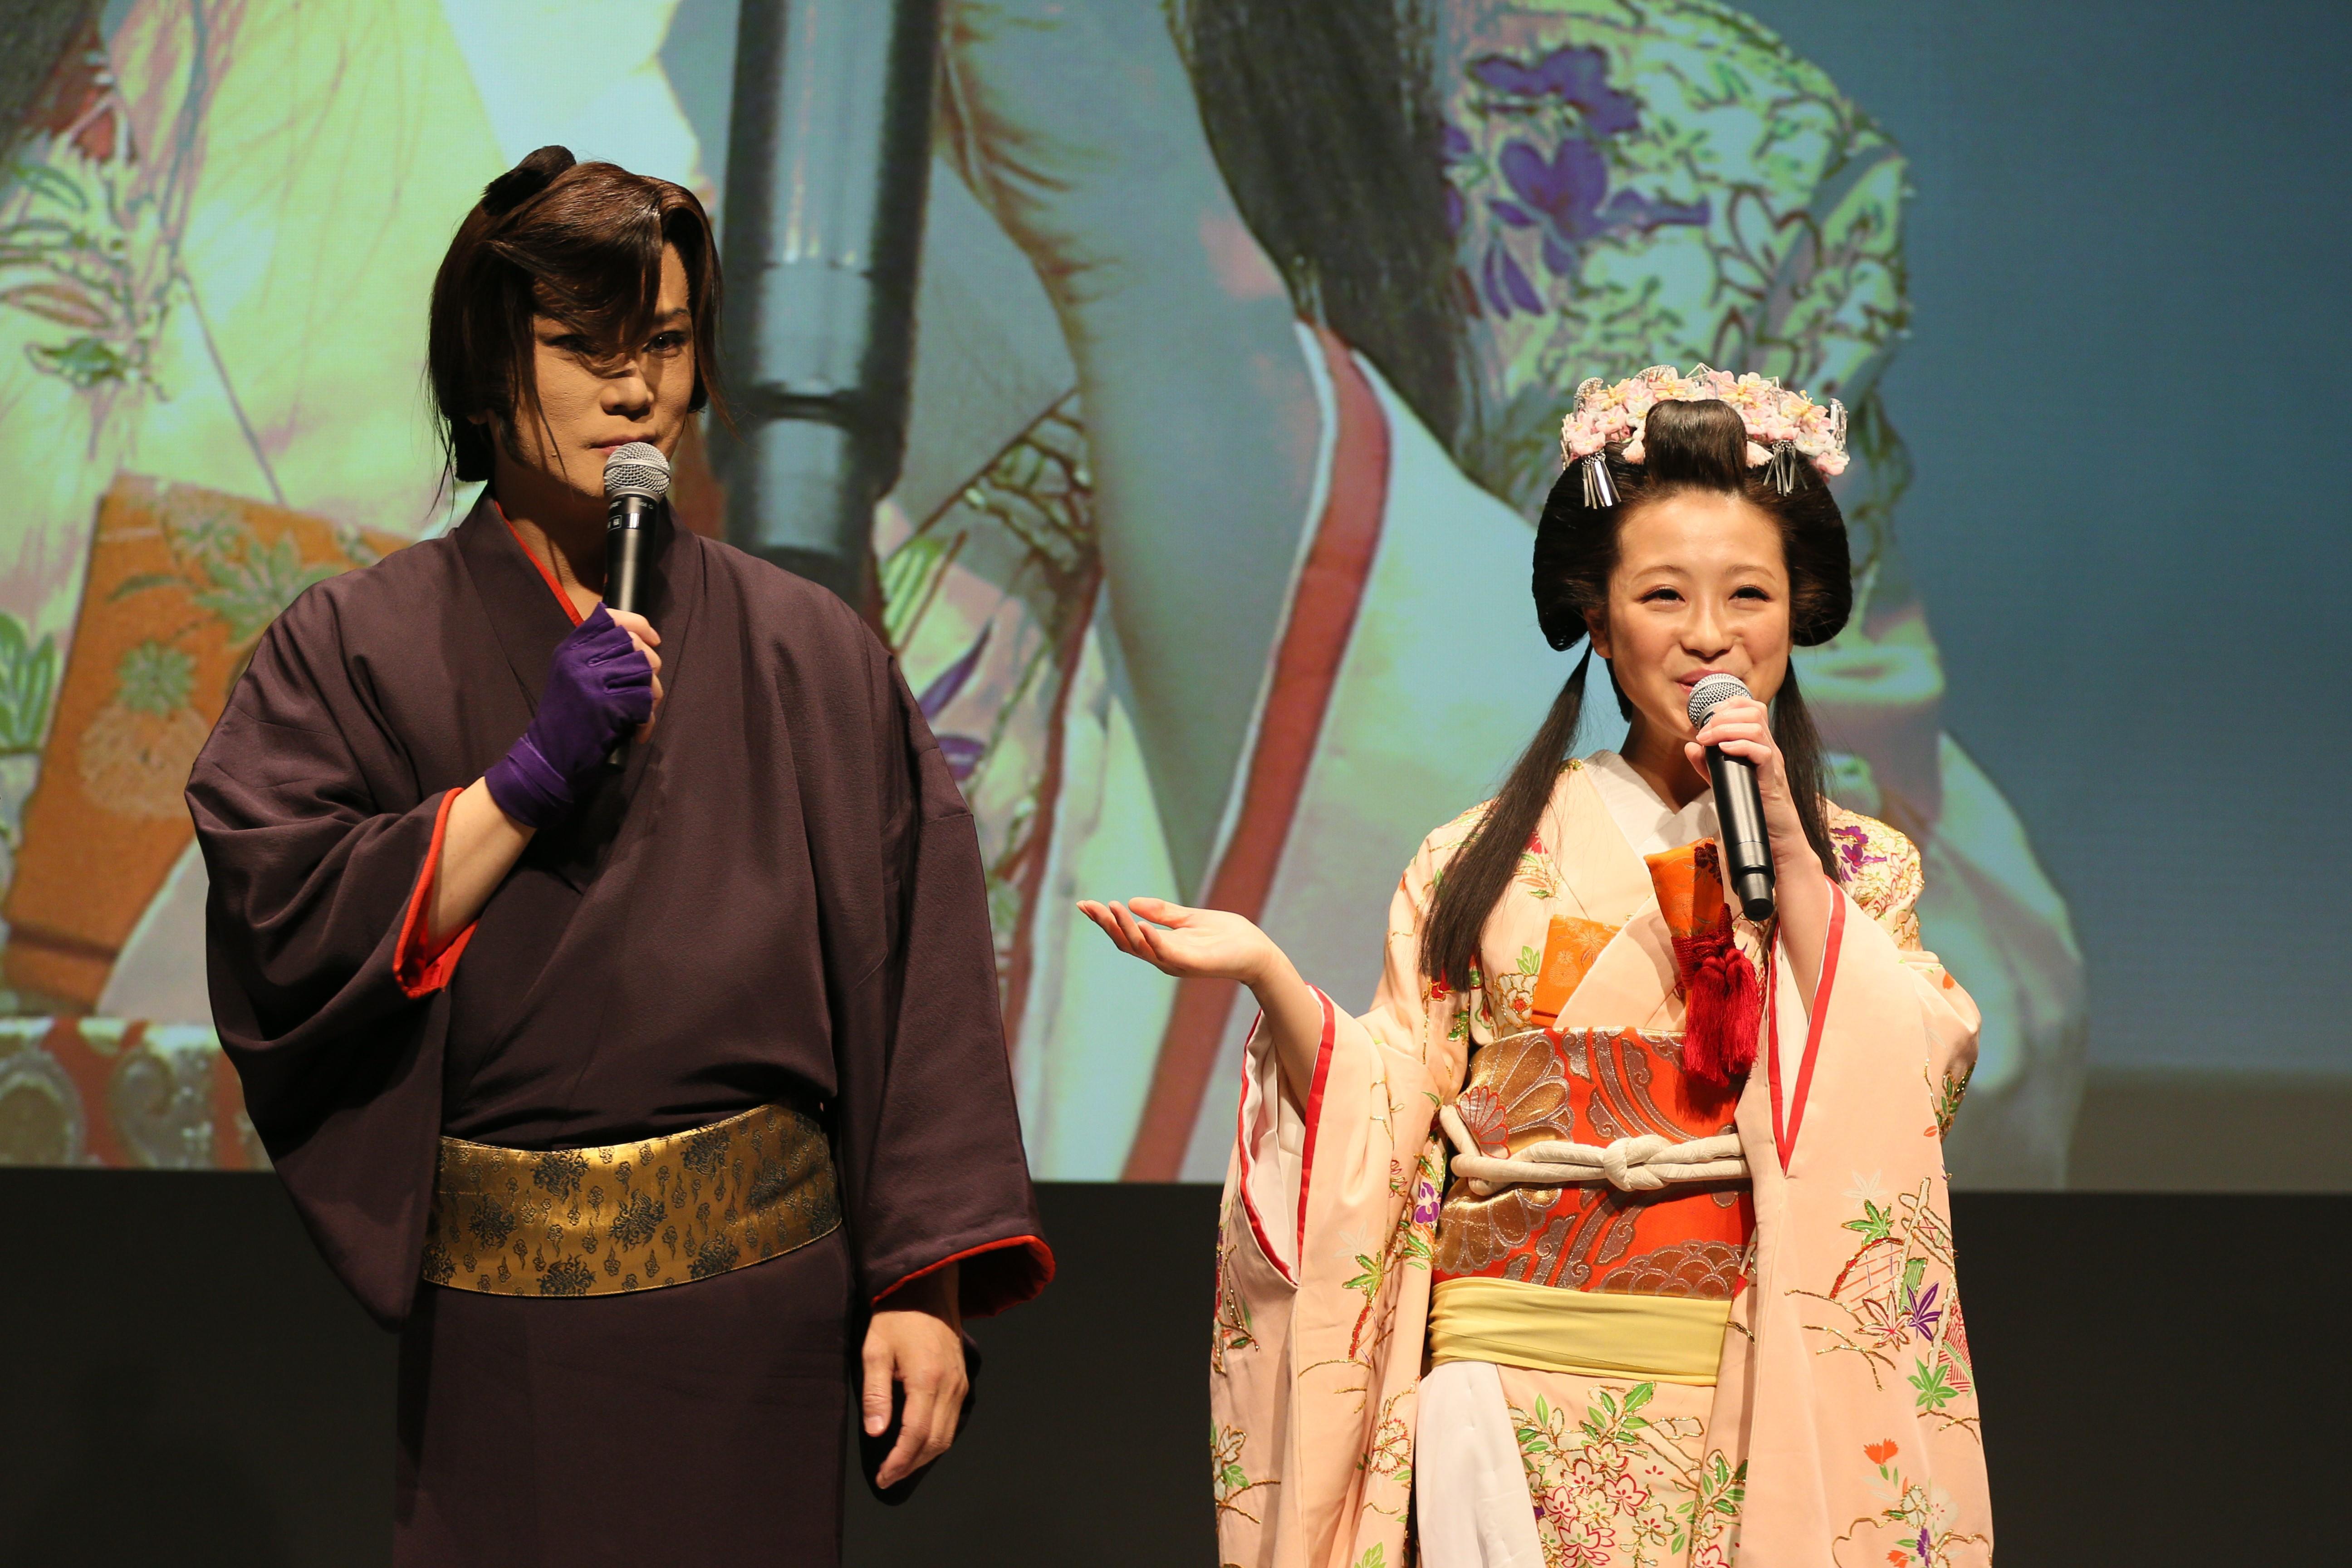 http://news.yoshimoto.co.jp/20170428173657-b6a0fe33cb770f8b19115d117c73bf7a4b34f8a6.jpg